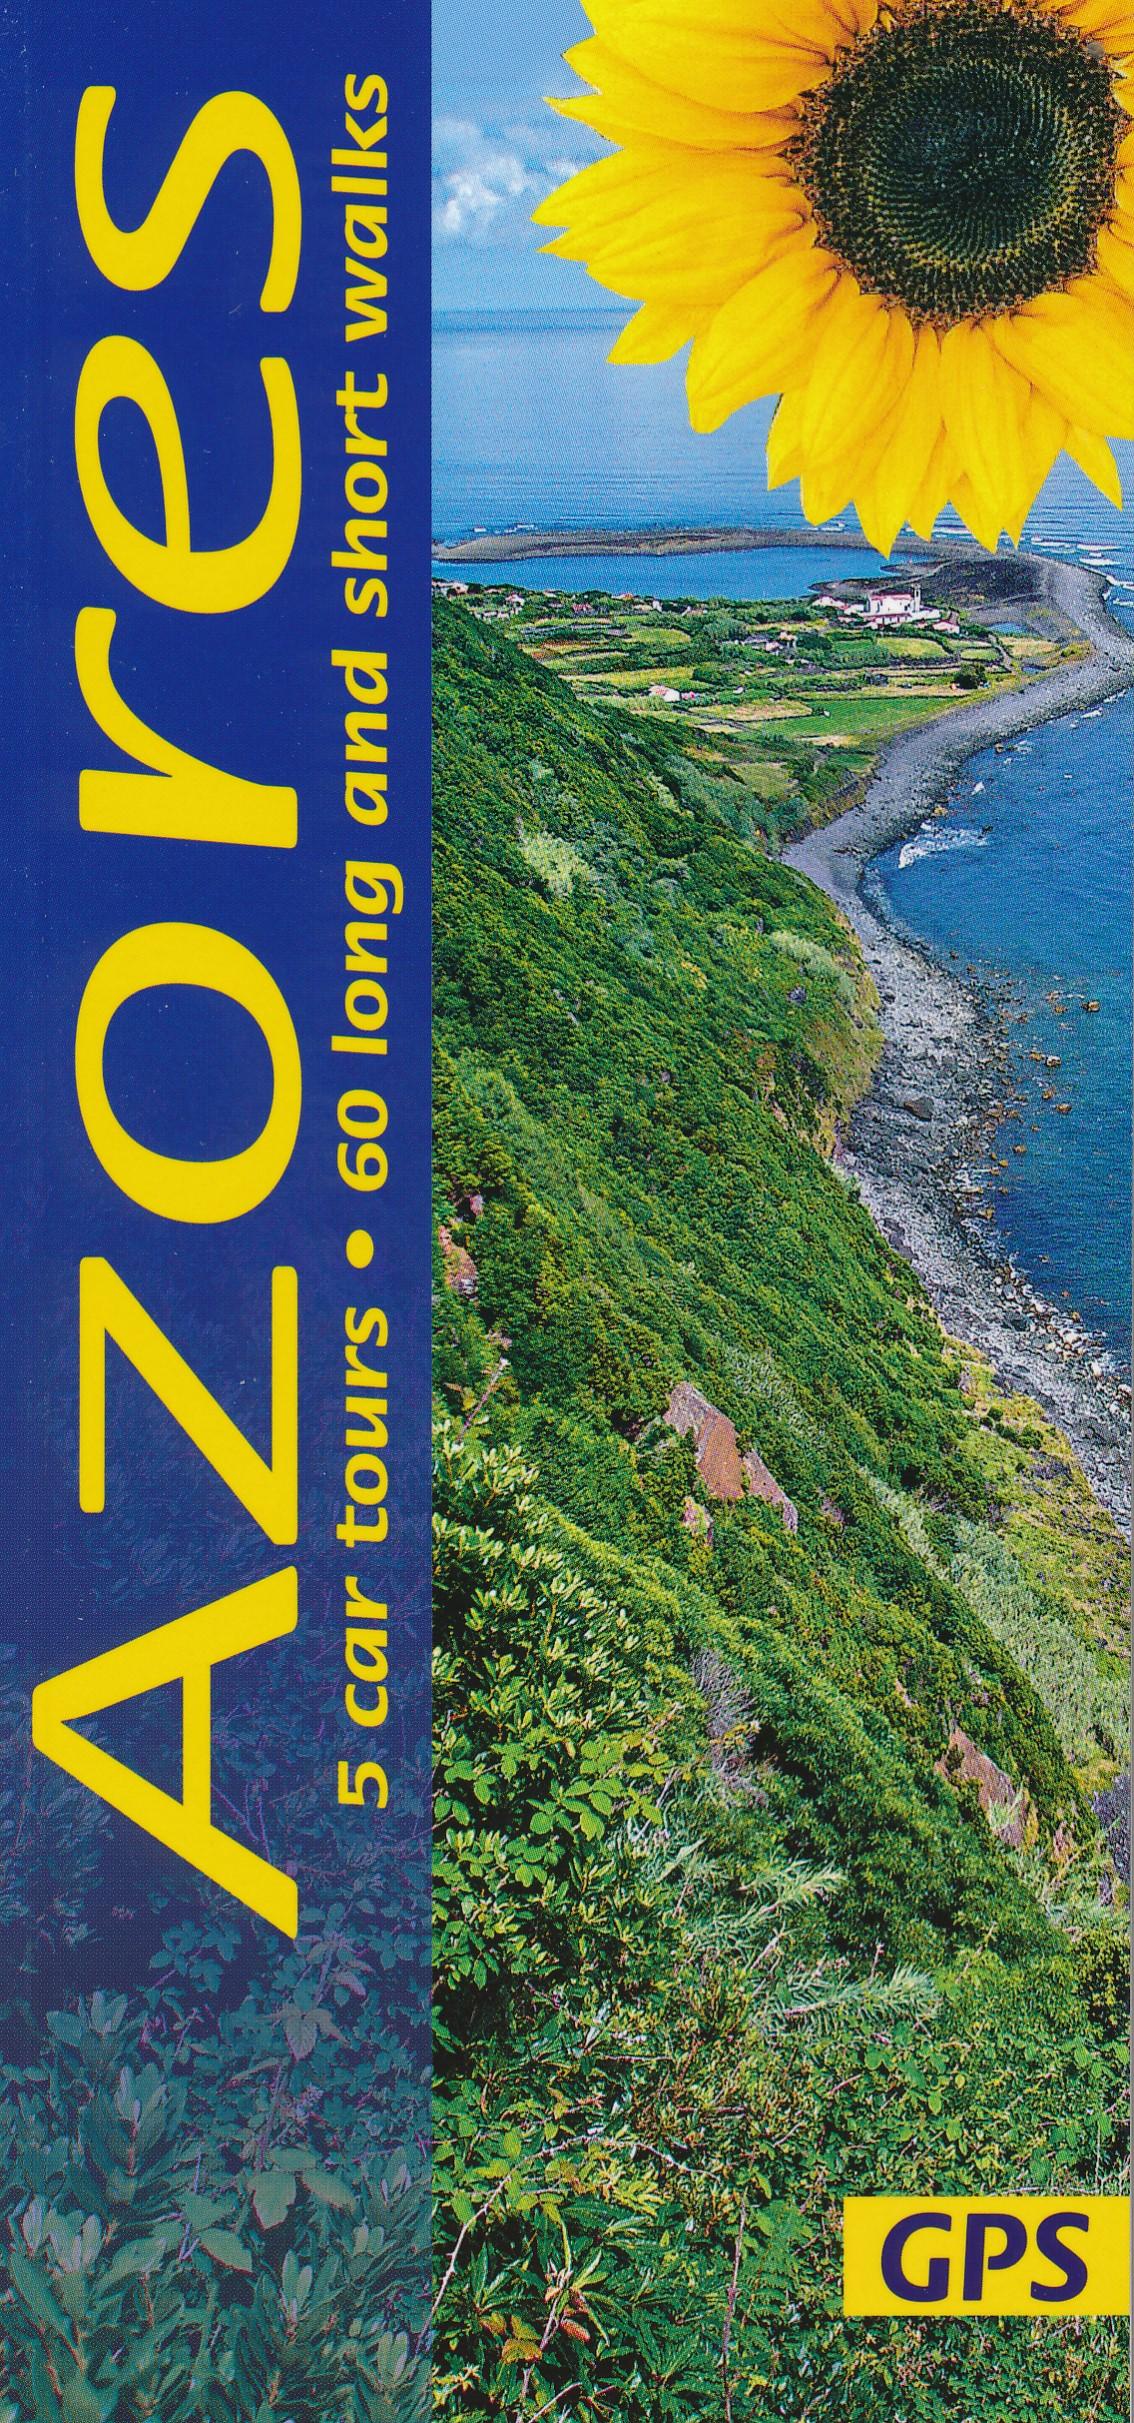 Sunflower Azores | wandelgids Azoren 9781856915120  Sunflower Landscapes  Wandelgidsen Azoren